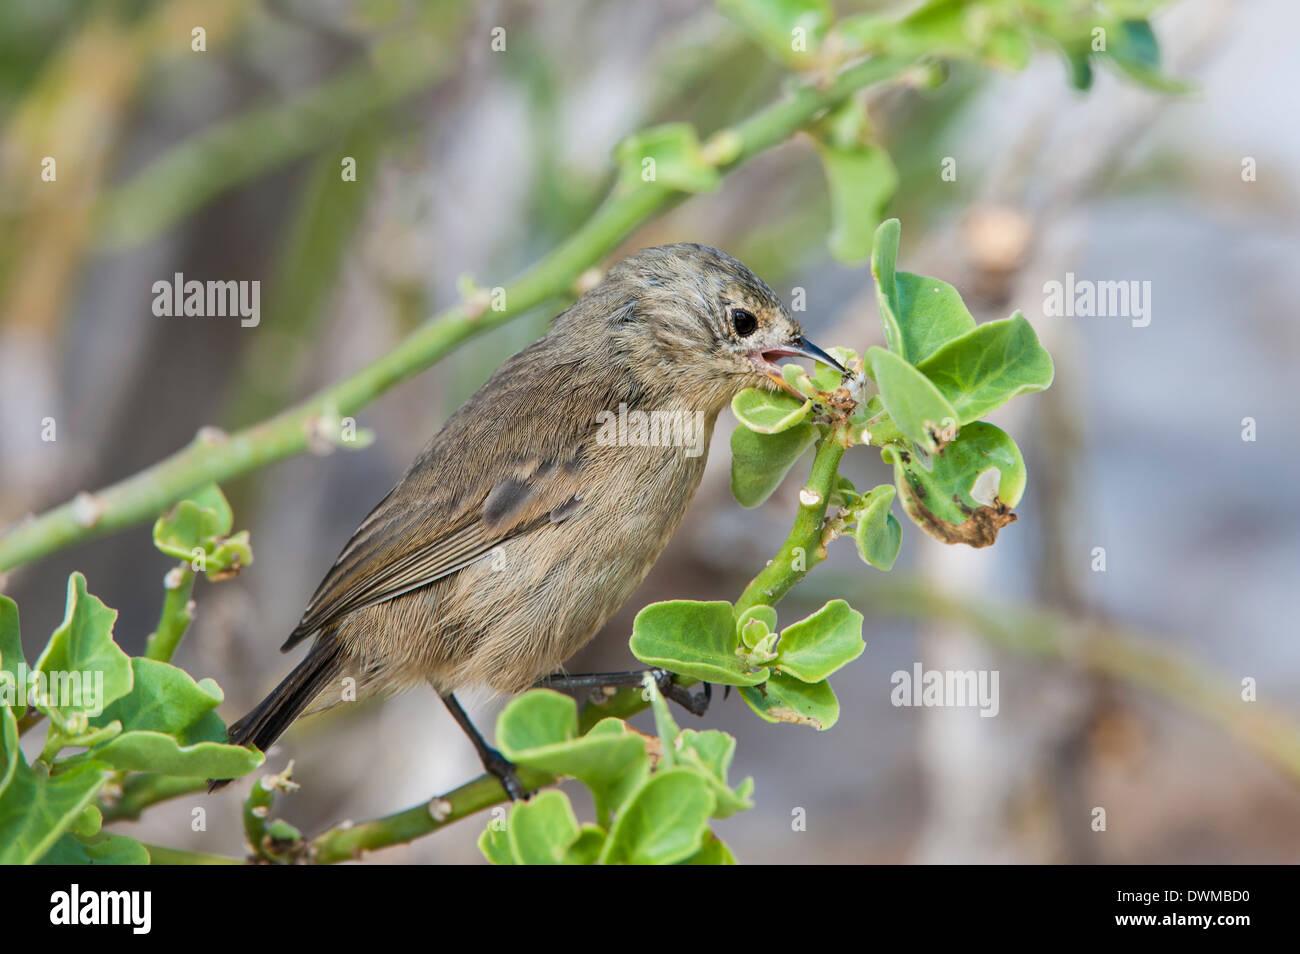 Warbler finch (Certhidea olivacea), Genovesa Island, Galapagos, UNESCO World Heritage Site, Ecuador, South America - Stock Image